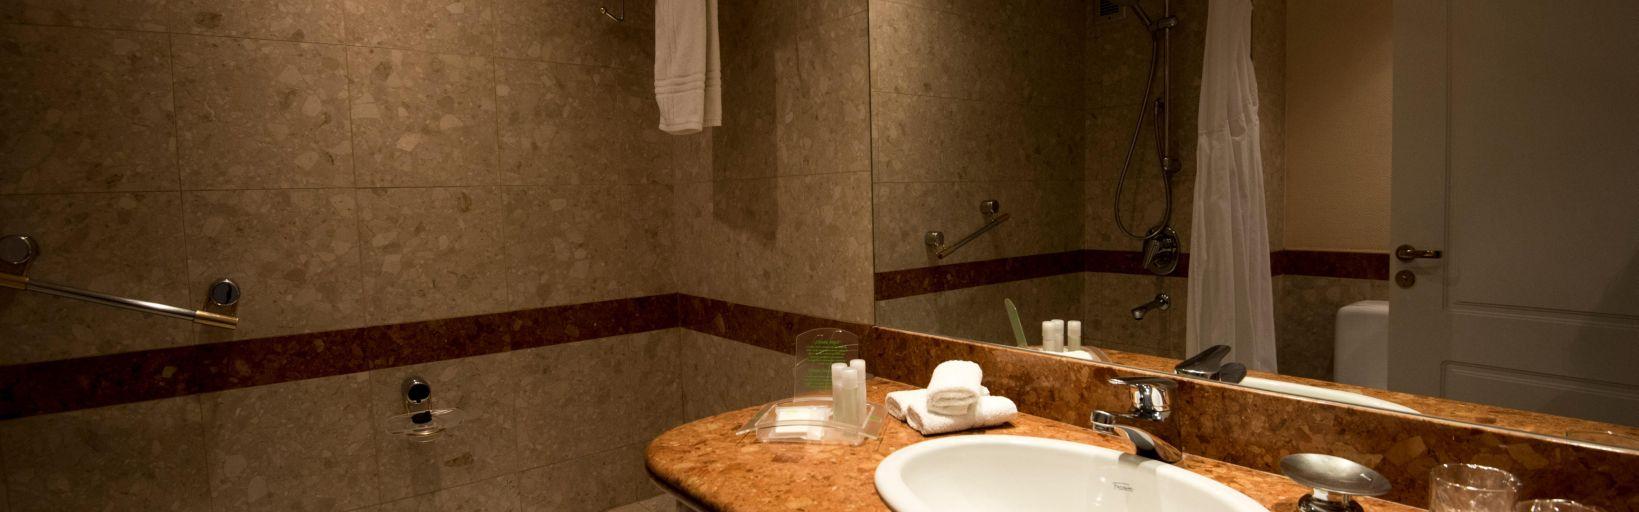 Holiday Inn Cordoba Hotels Holiday Inn Cordoba Hotel Room Rates